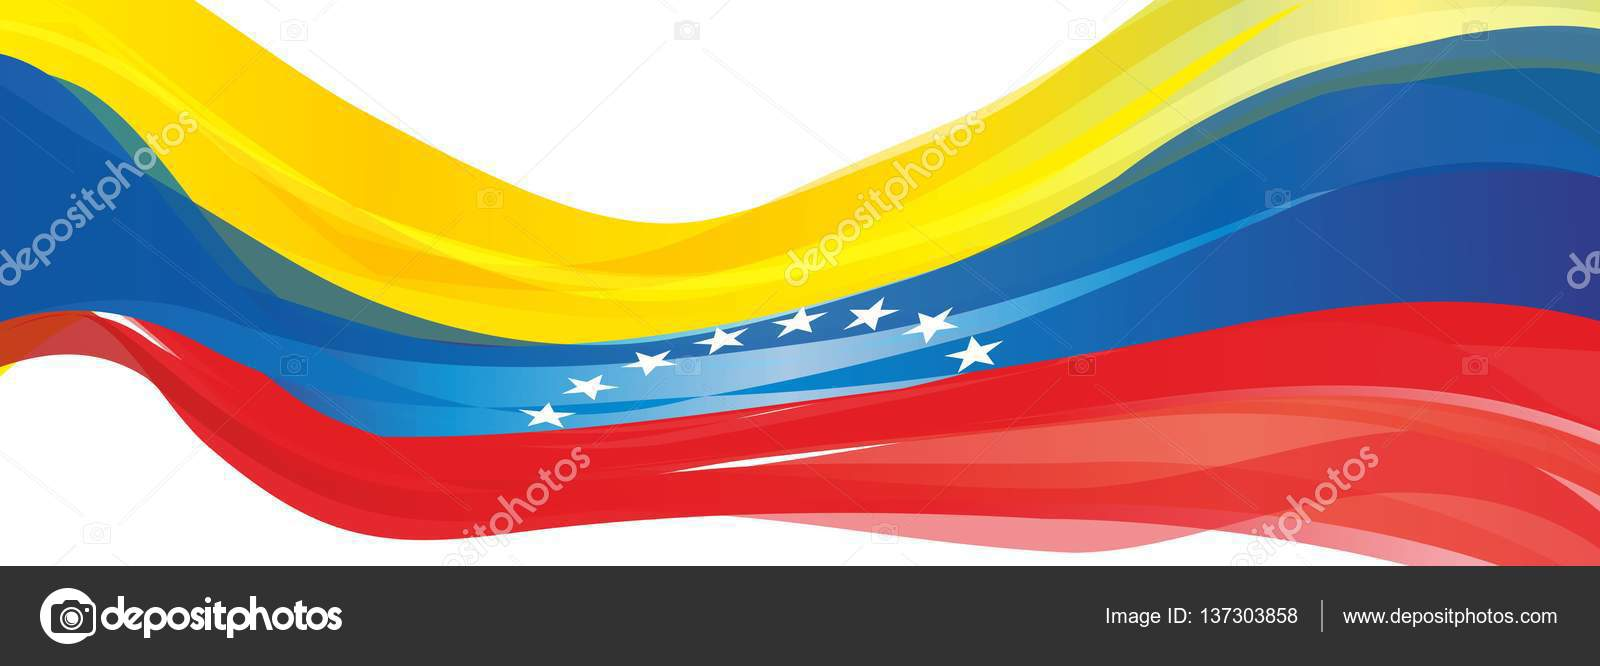 Bandera amarilla roja blanca